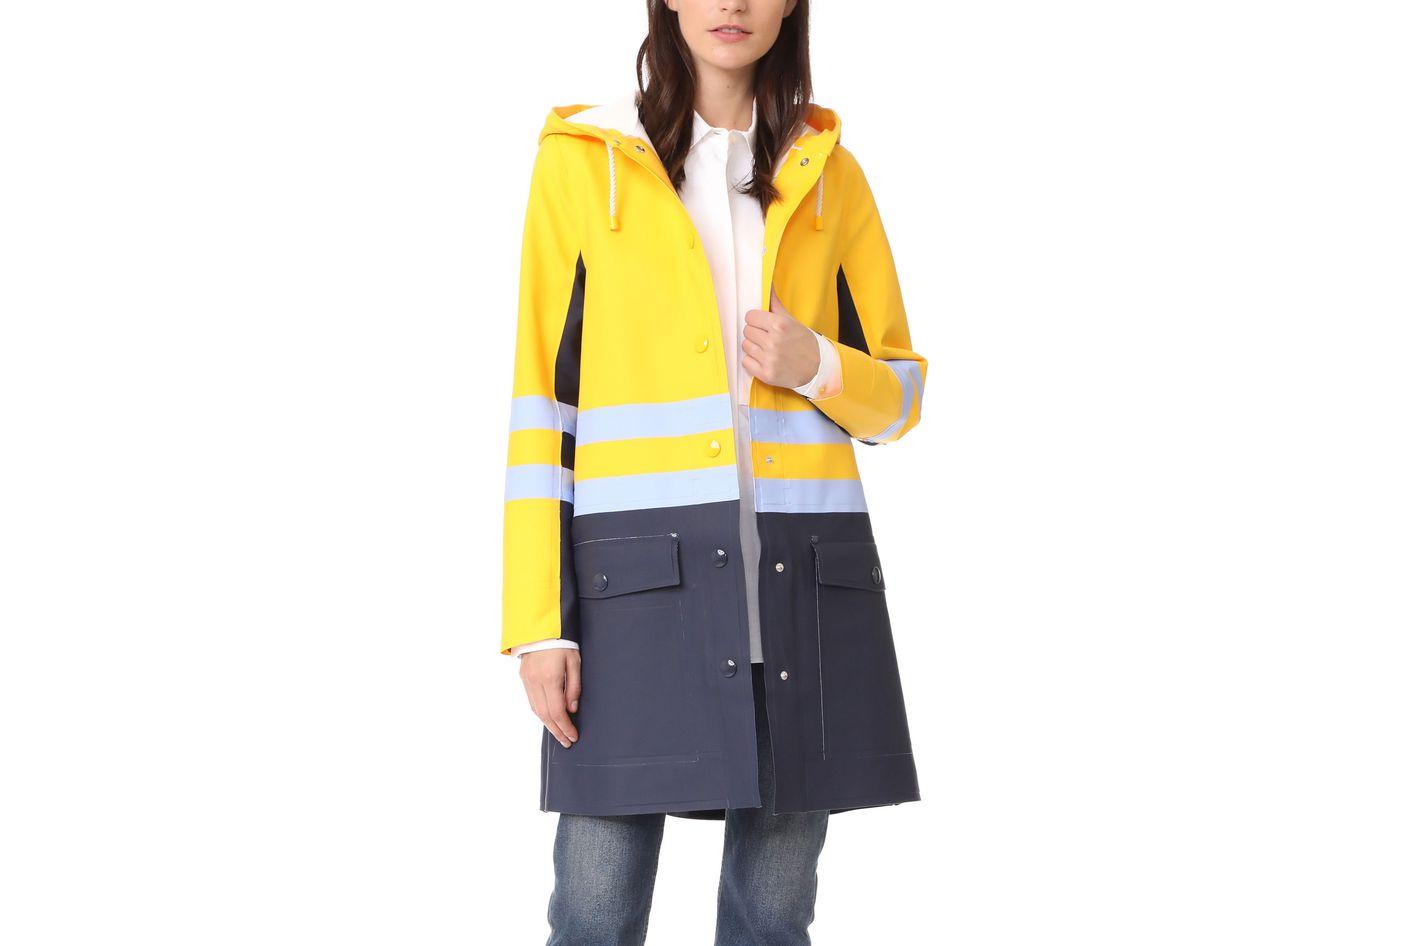 Marni x Stutterheim Rain Jacket